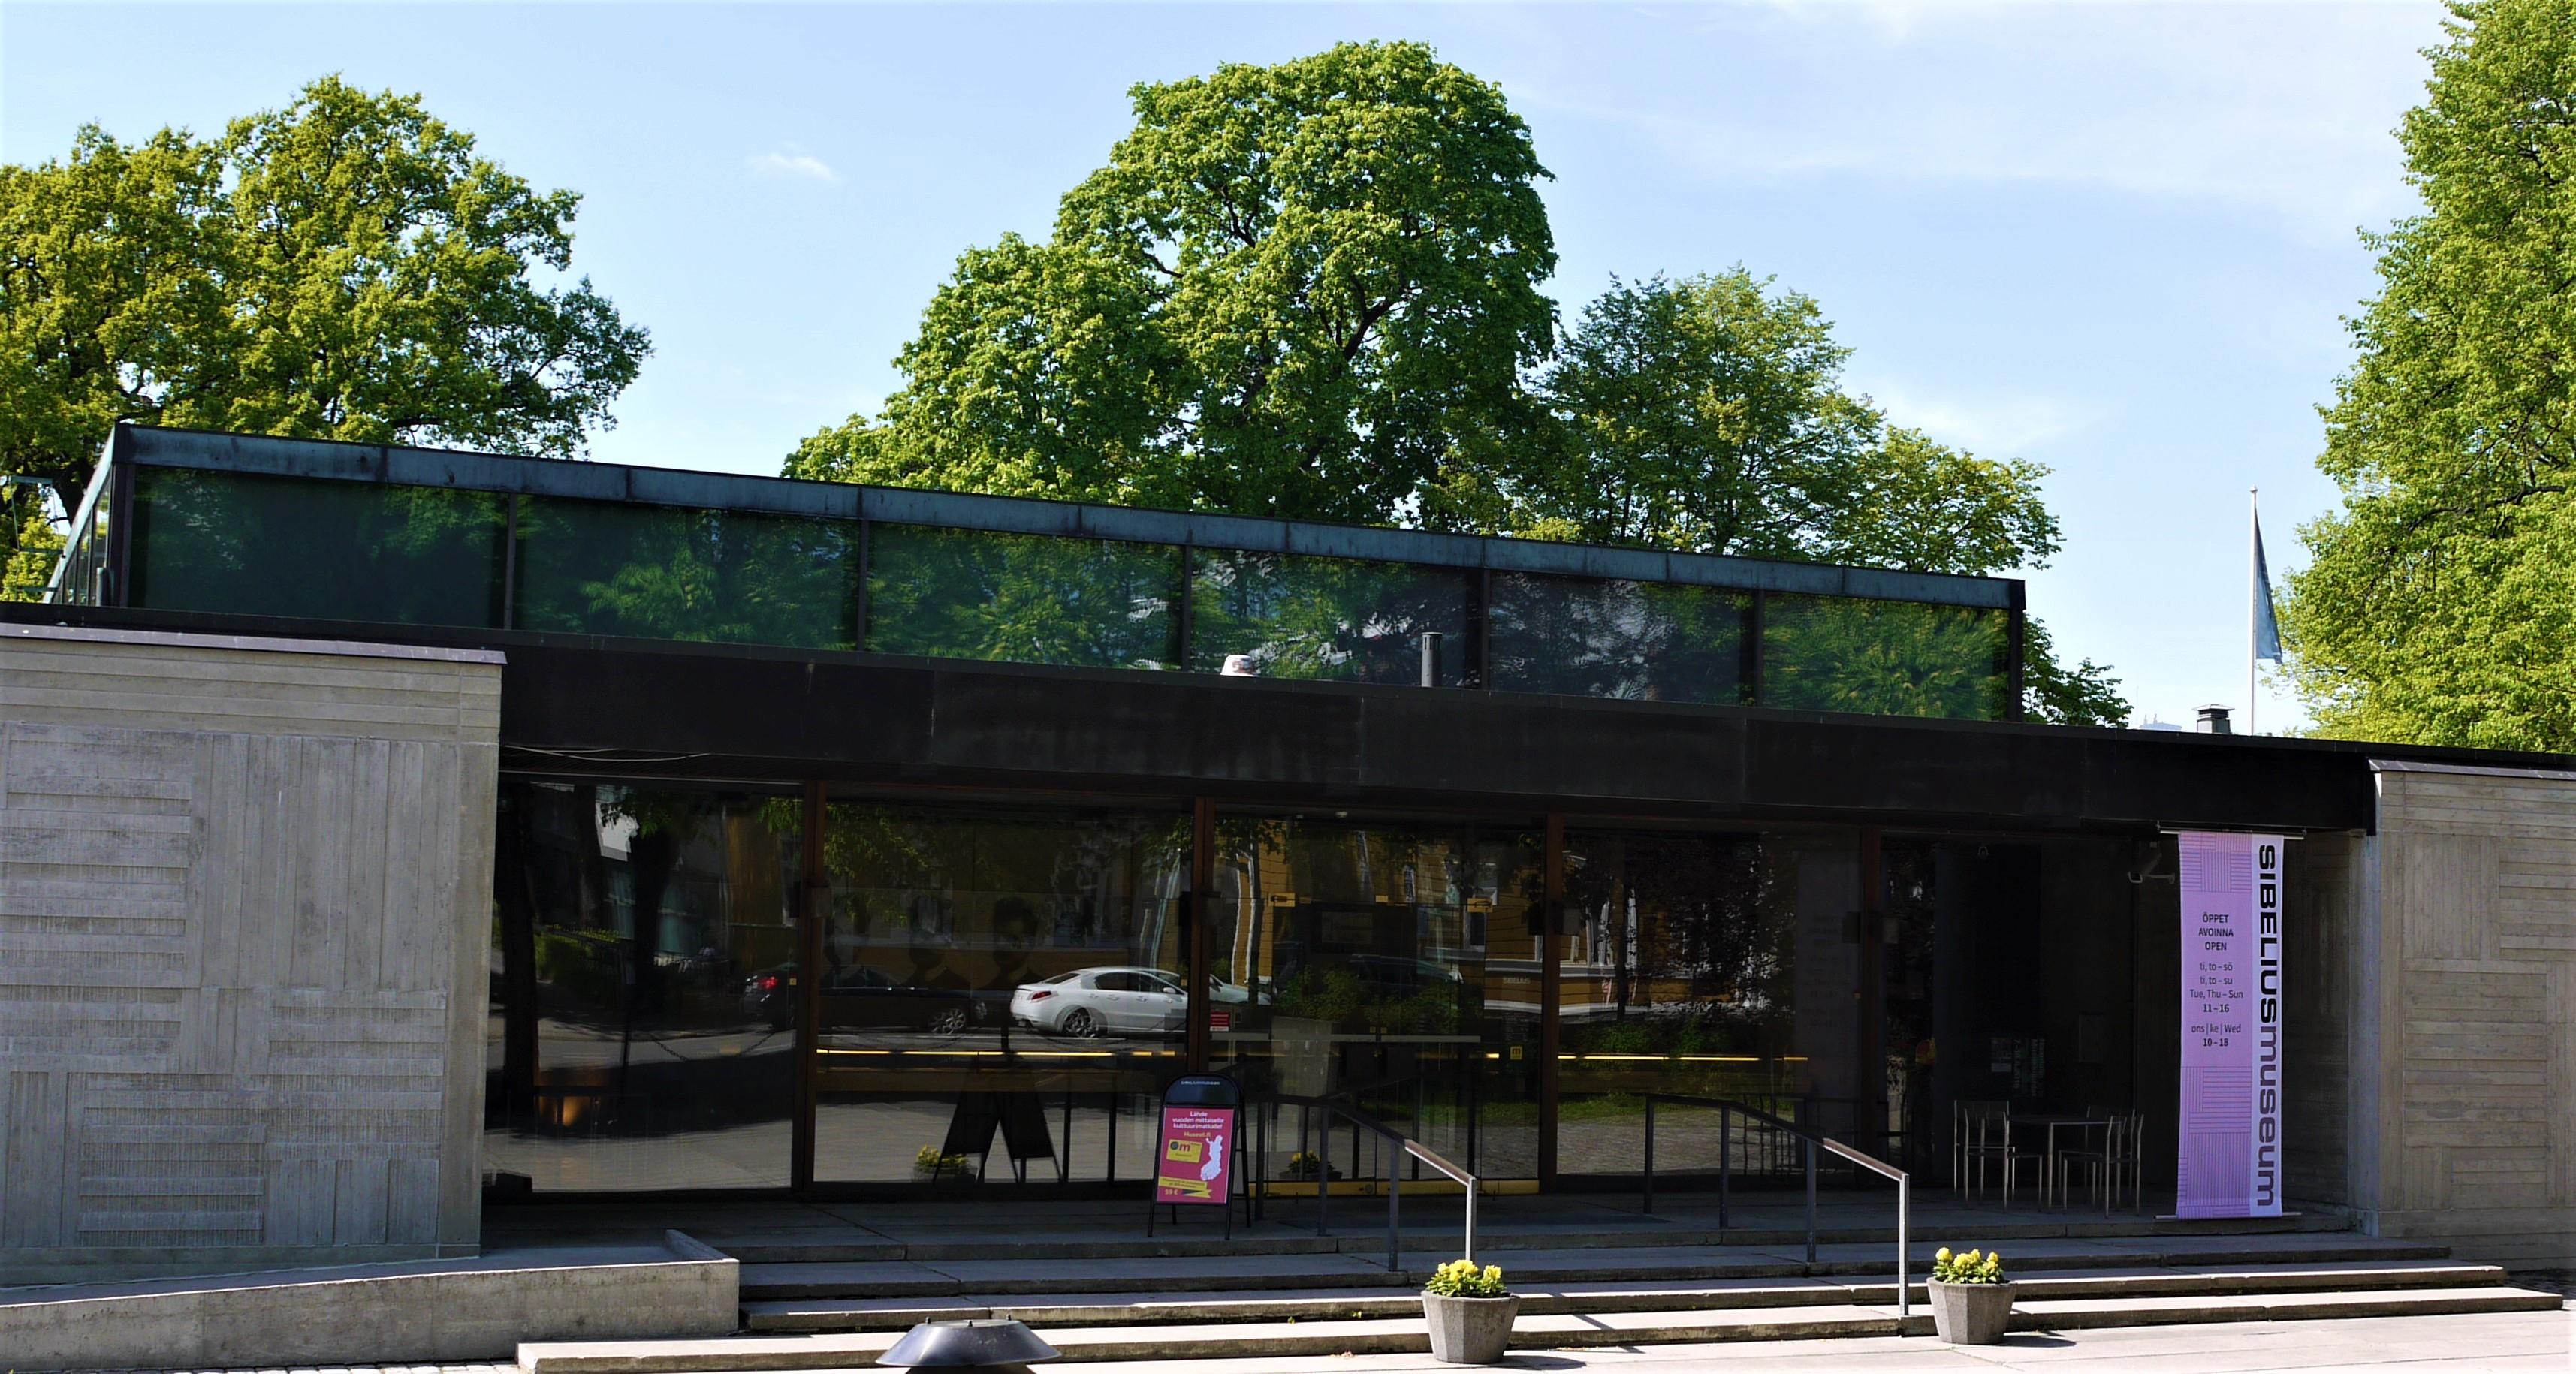 Sibelius Museum, Turku